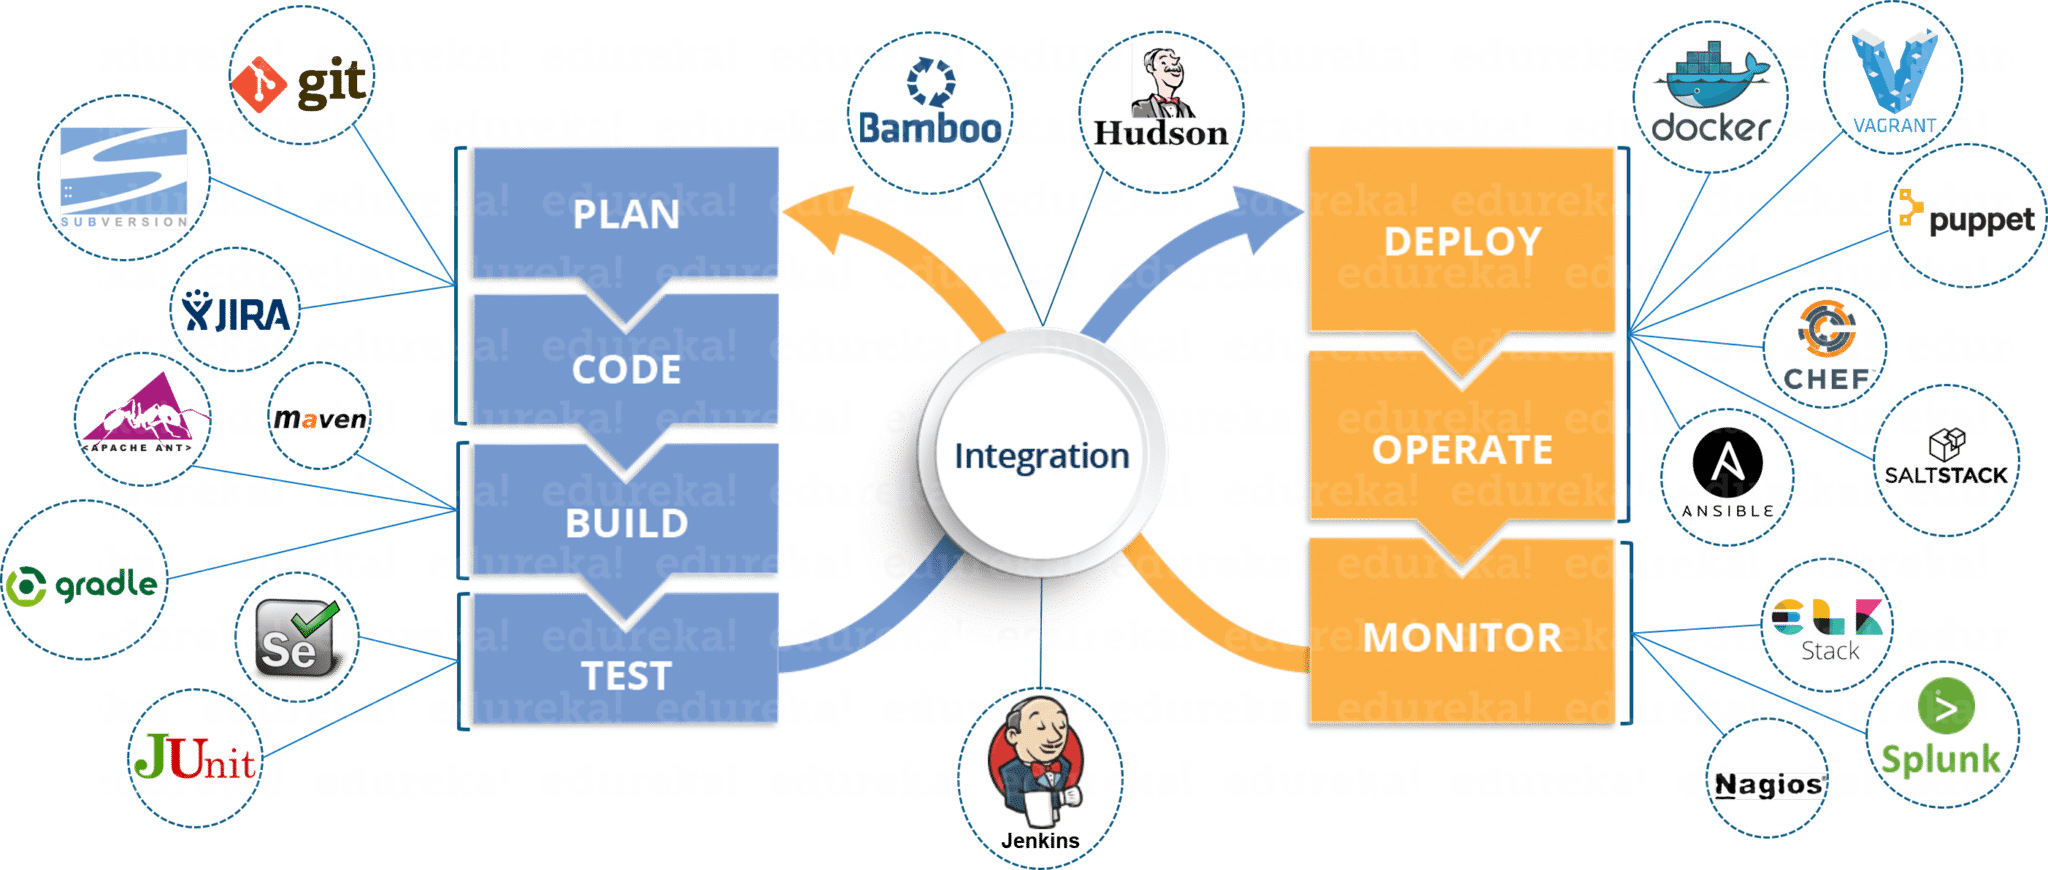 devops tools - edureka